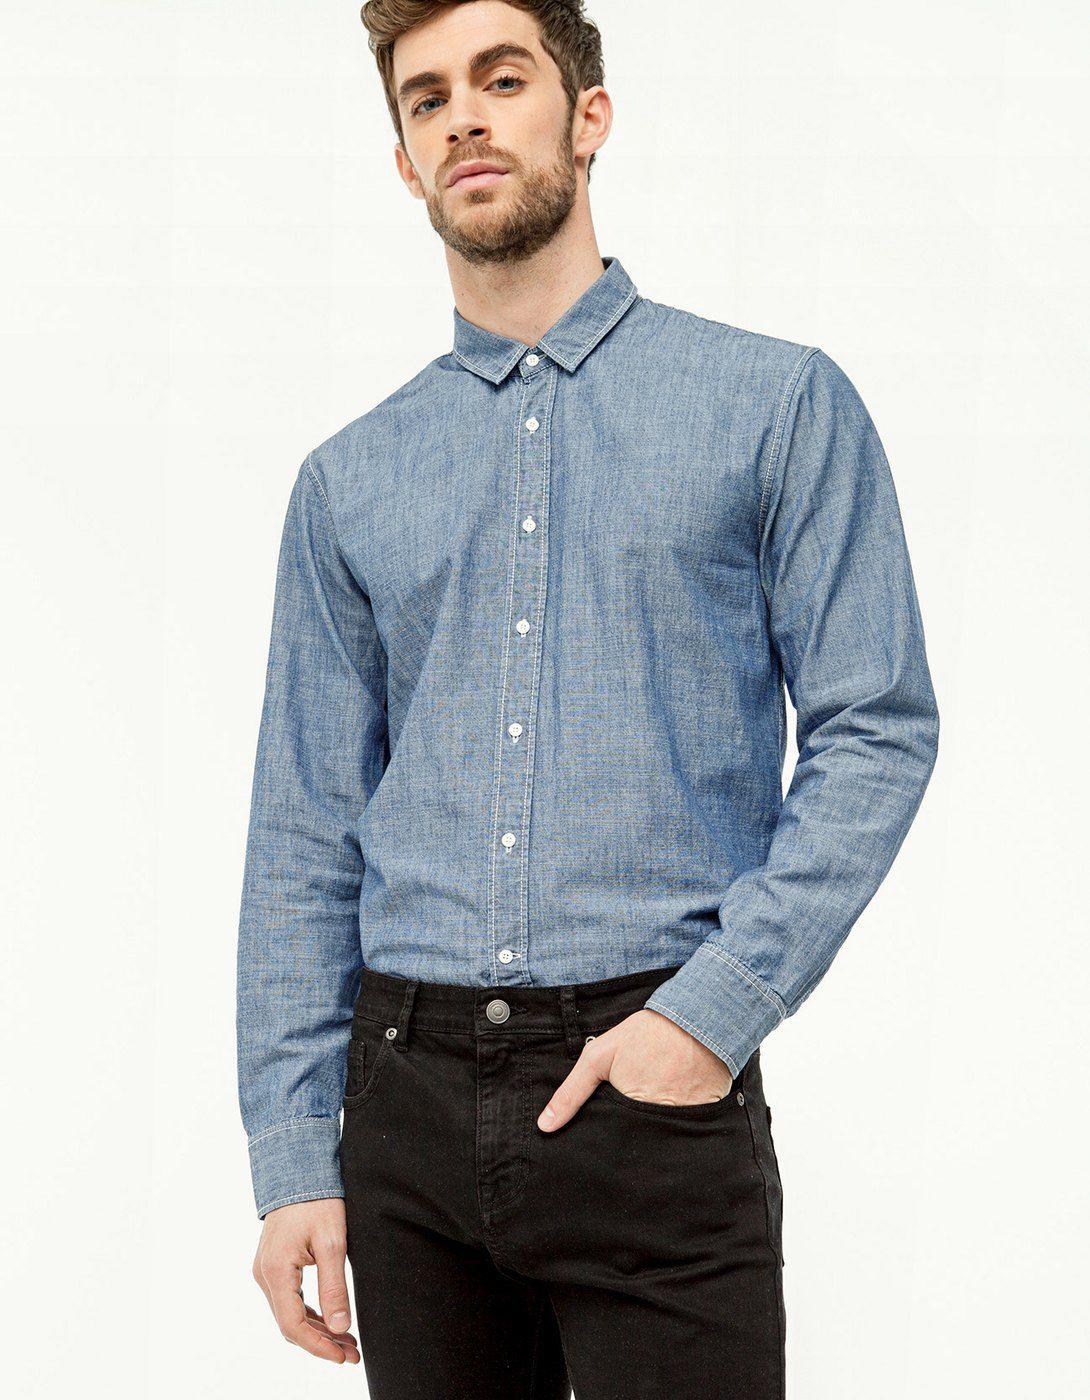 Camisa manga larga chambray - Camisas | Stradivarius España